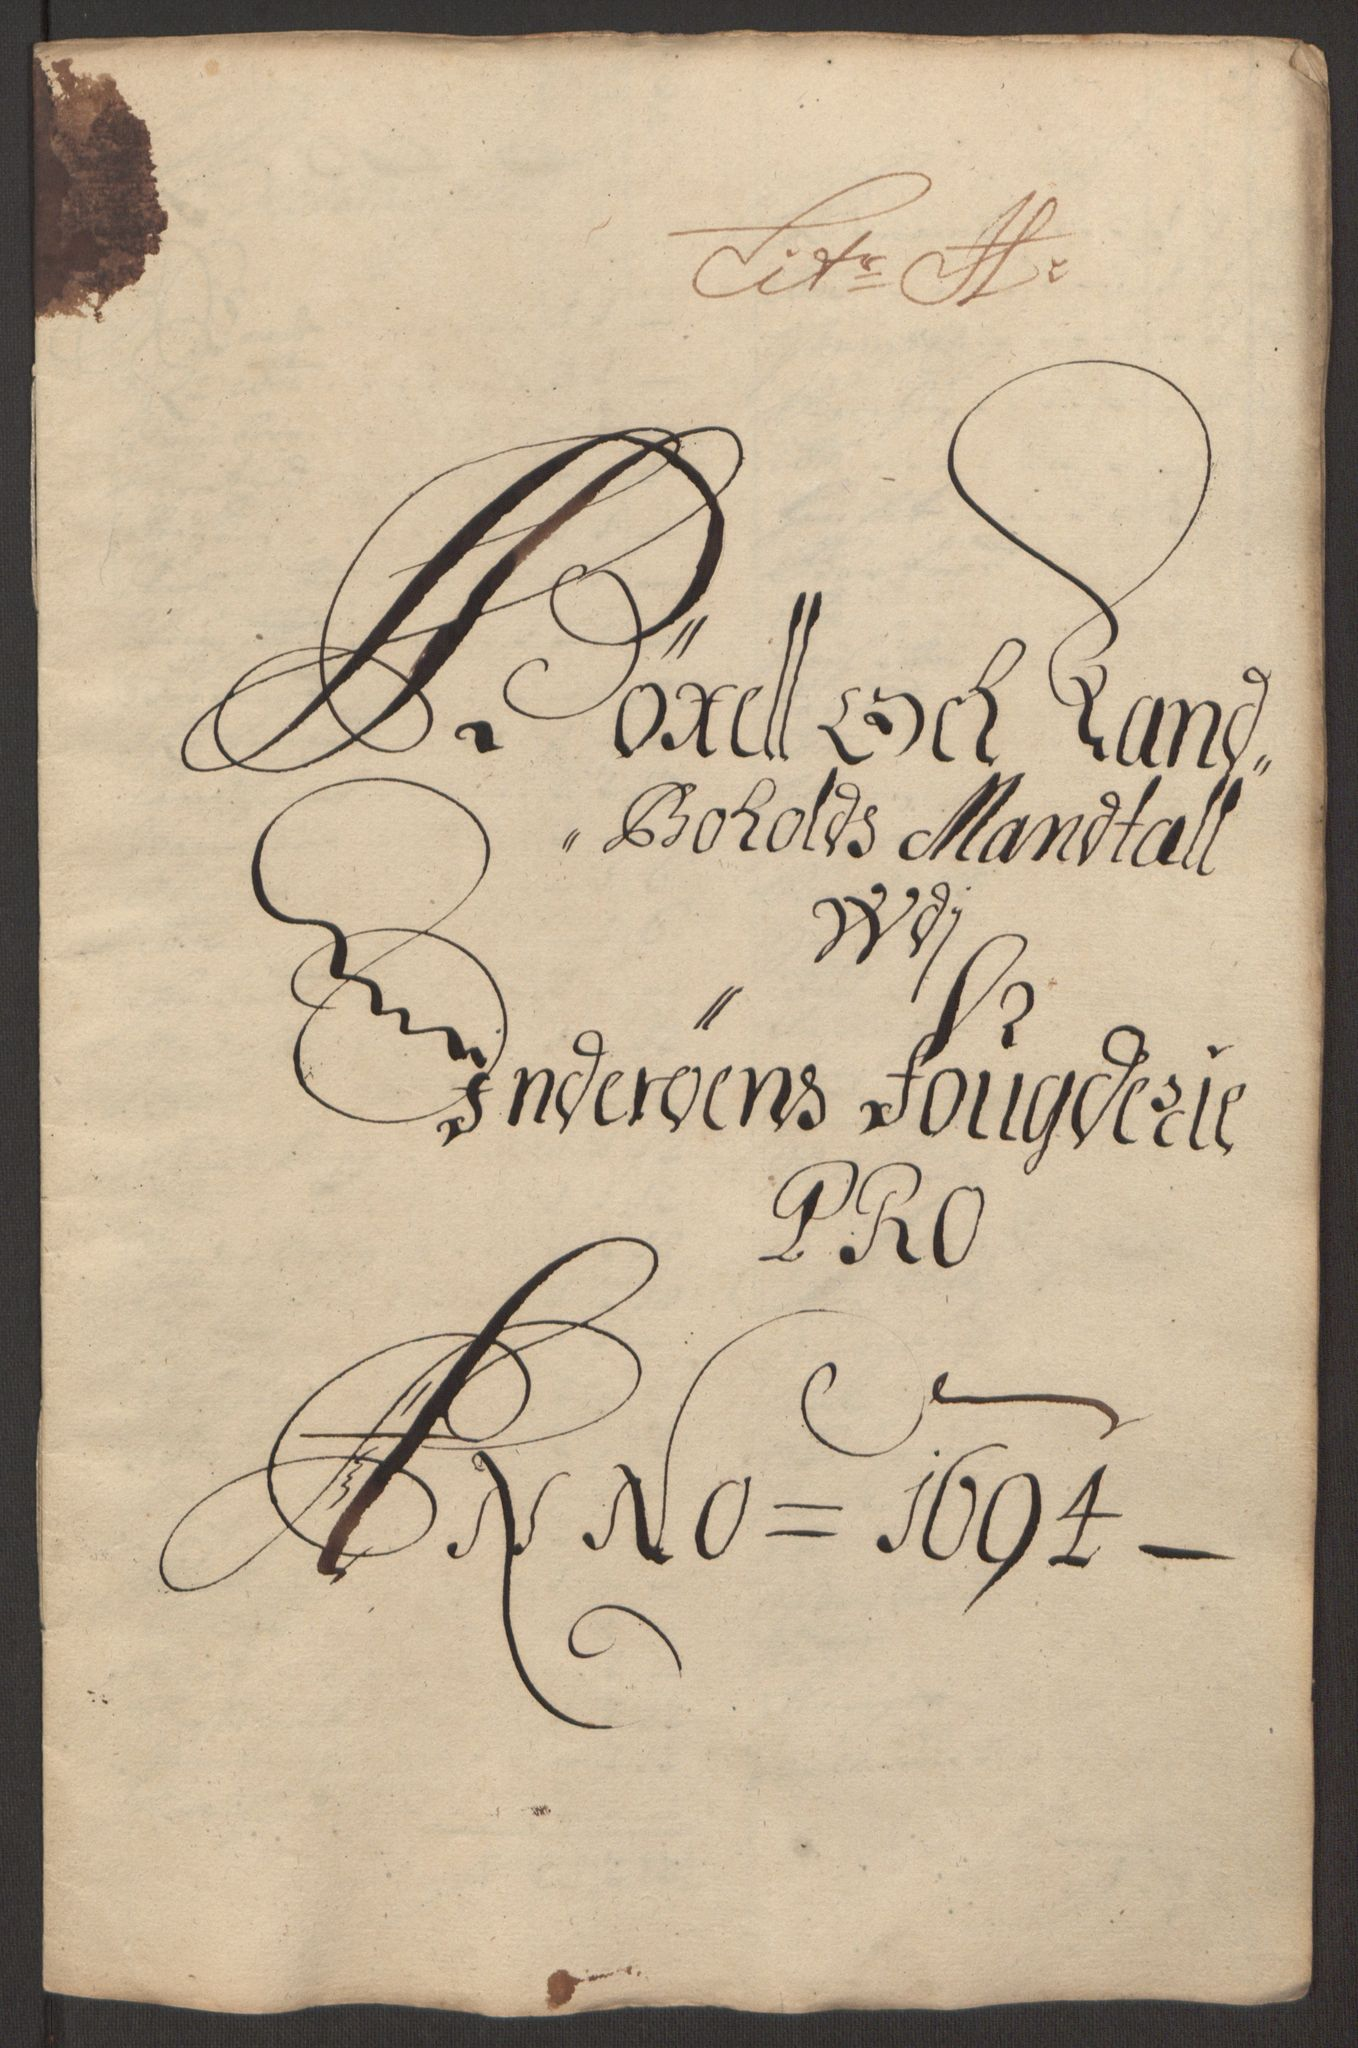 RA, Rentekammeret inntil 1814, Reviderte regnskaper, Fogderegnskap, R63/L4308: Fogderegnskap Inderøy, 1692-1694, s. 604